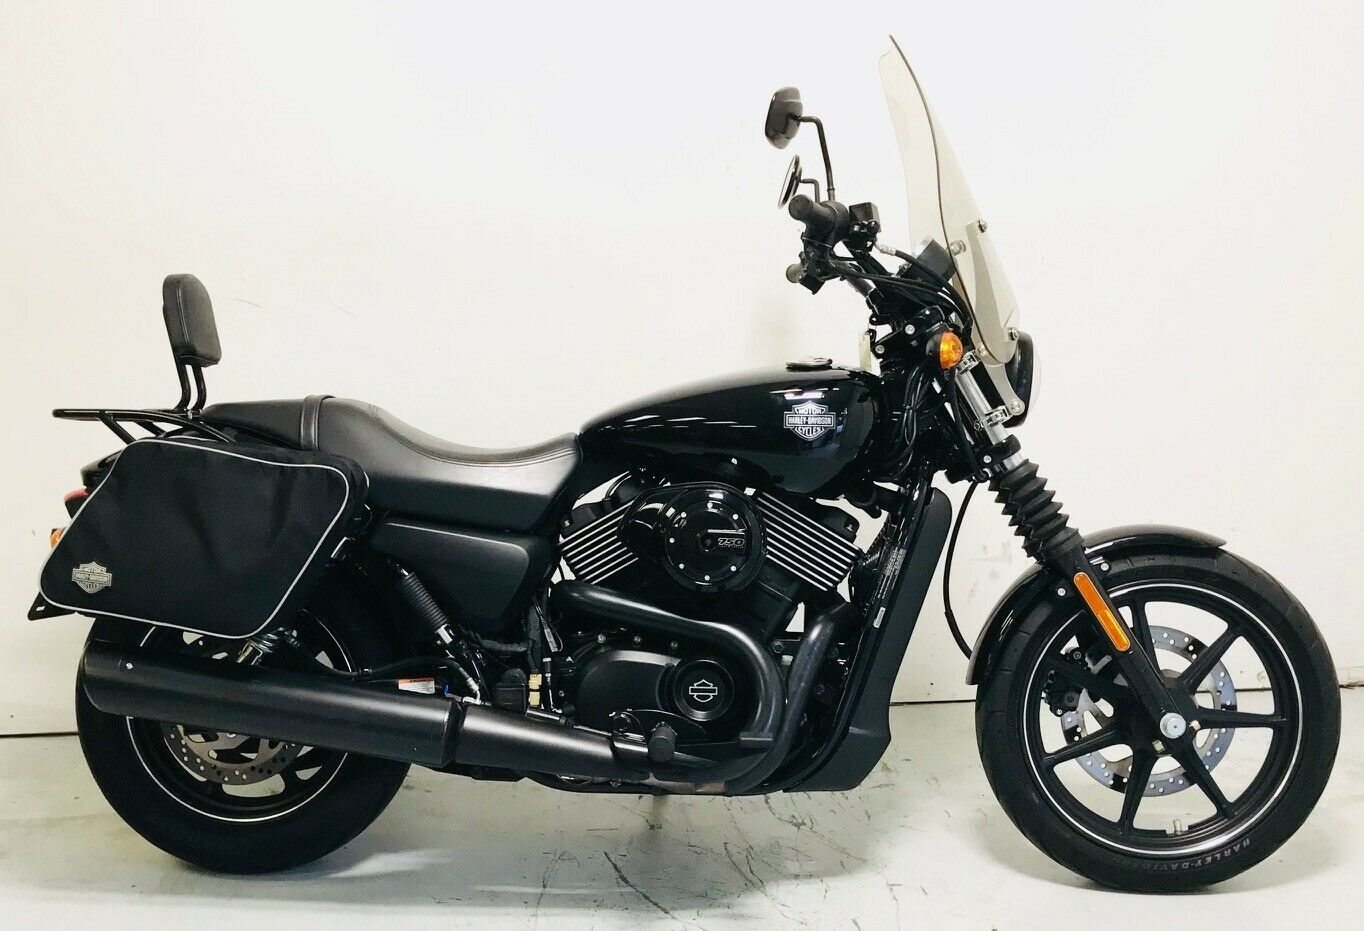 2015 HarleyDavidson Street 2015 Harley Davidson XG750